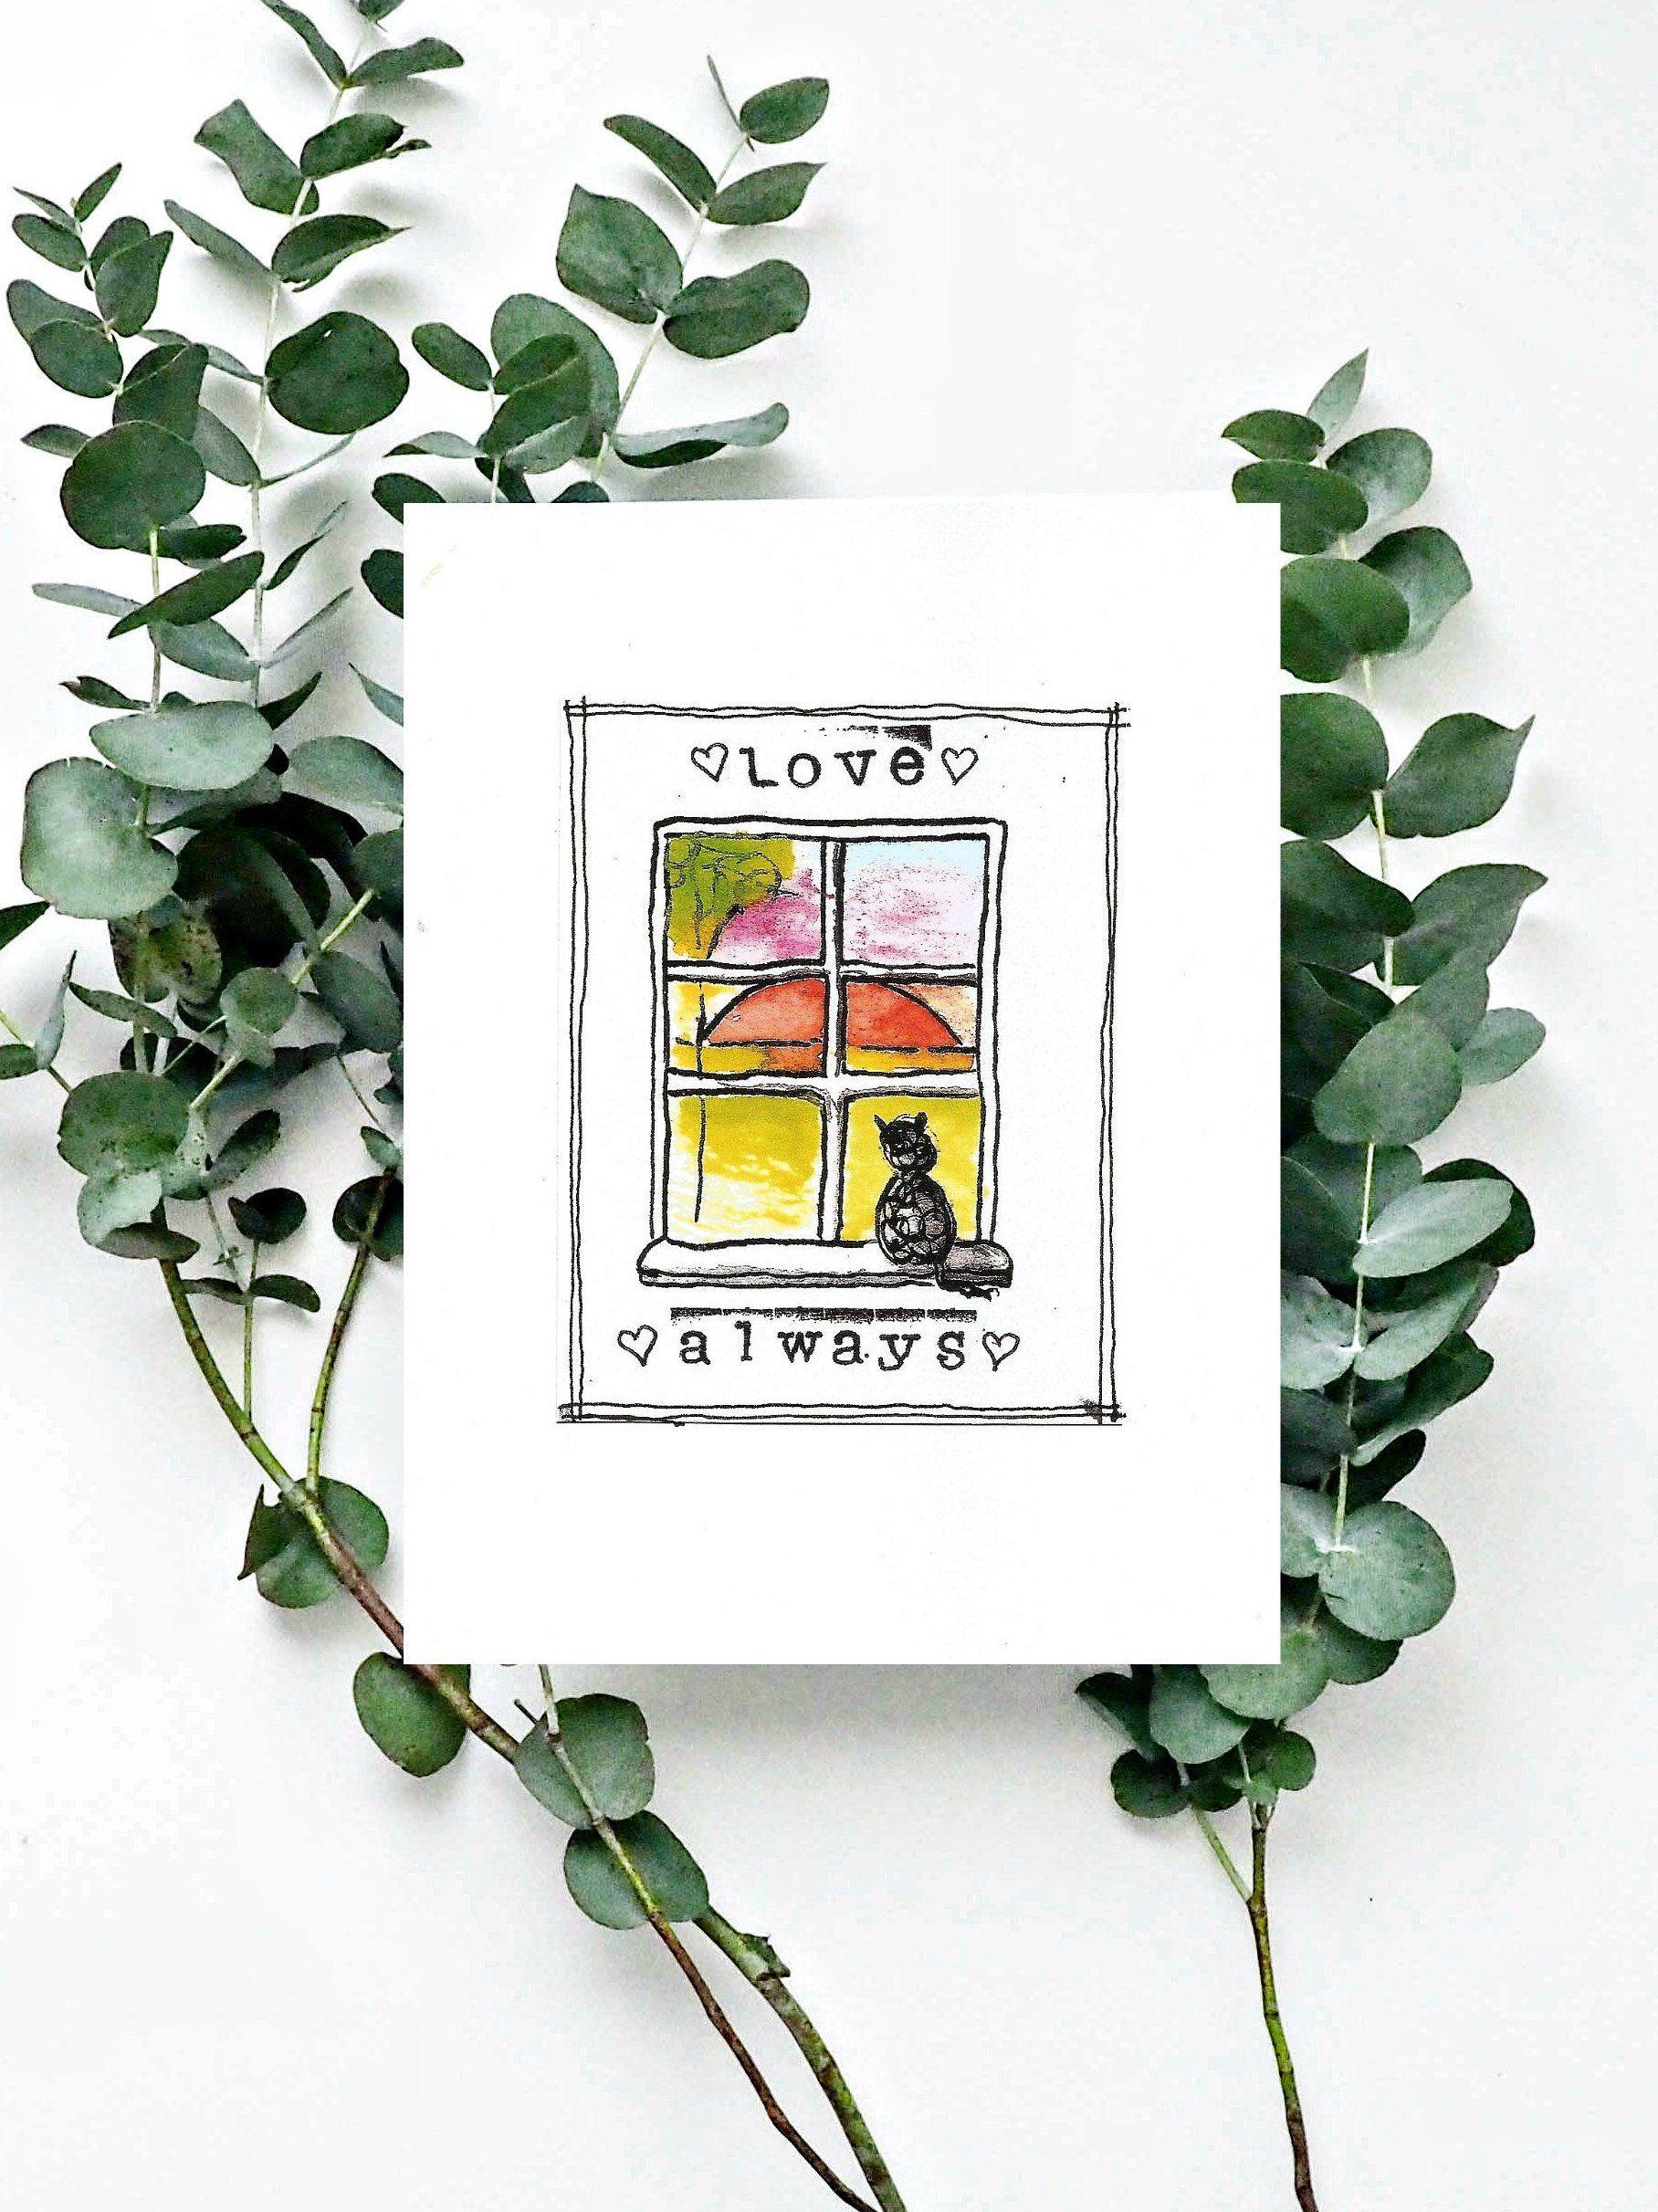 Cat Loss, cat sympathy card, pet loss, pet memorial gift, pet loss gift, sympathy gift, pet memorial, loss of cat, art print, illustration by ...